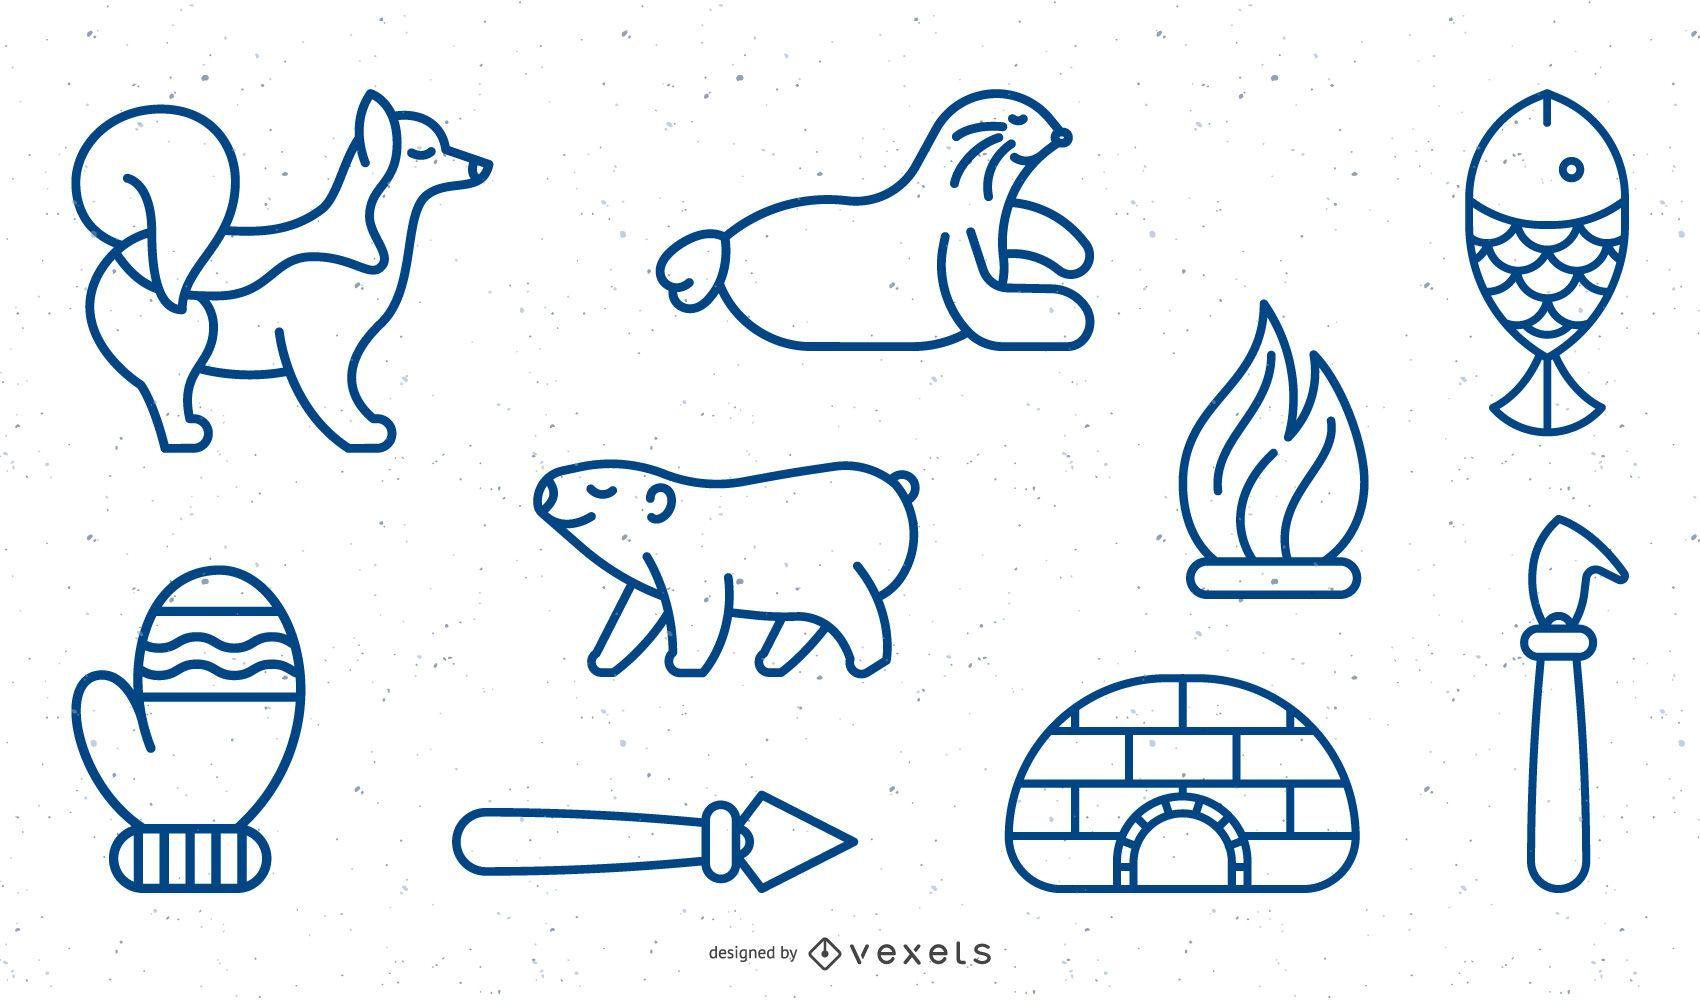 Eskimo elements stroke set